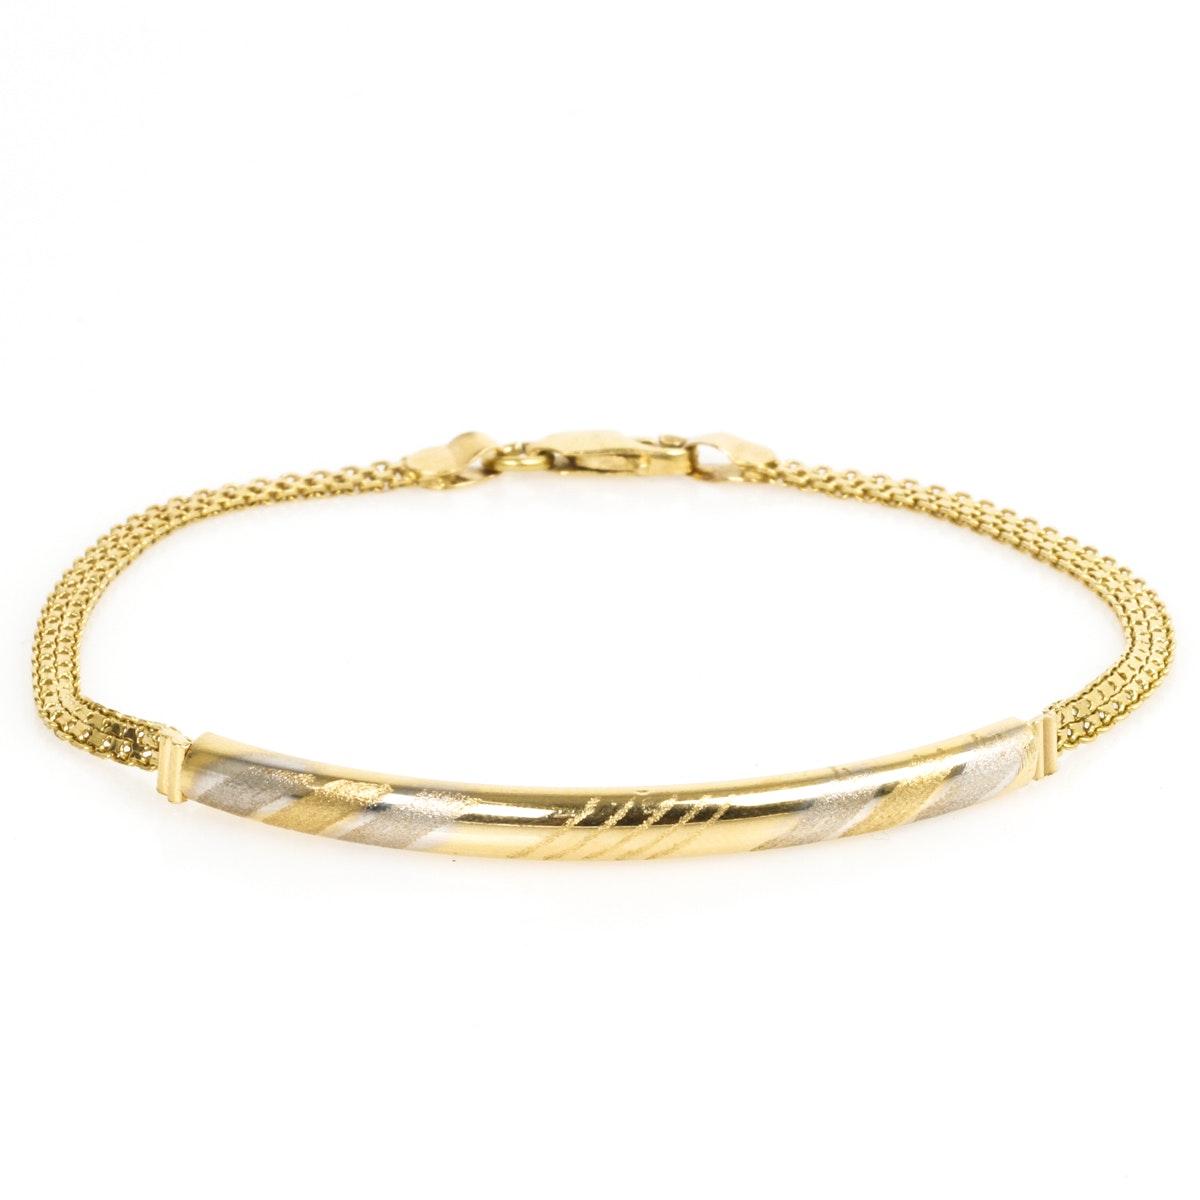 14K Yellow Gold Curved Bar Bracelet